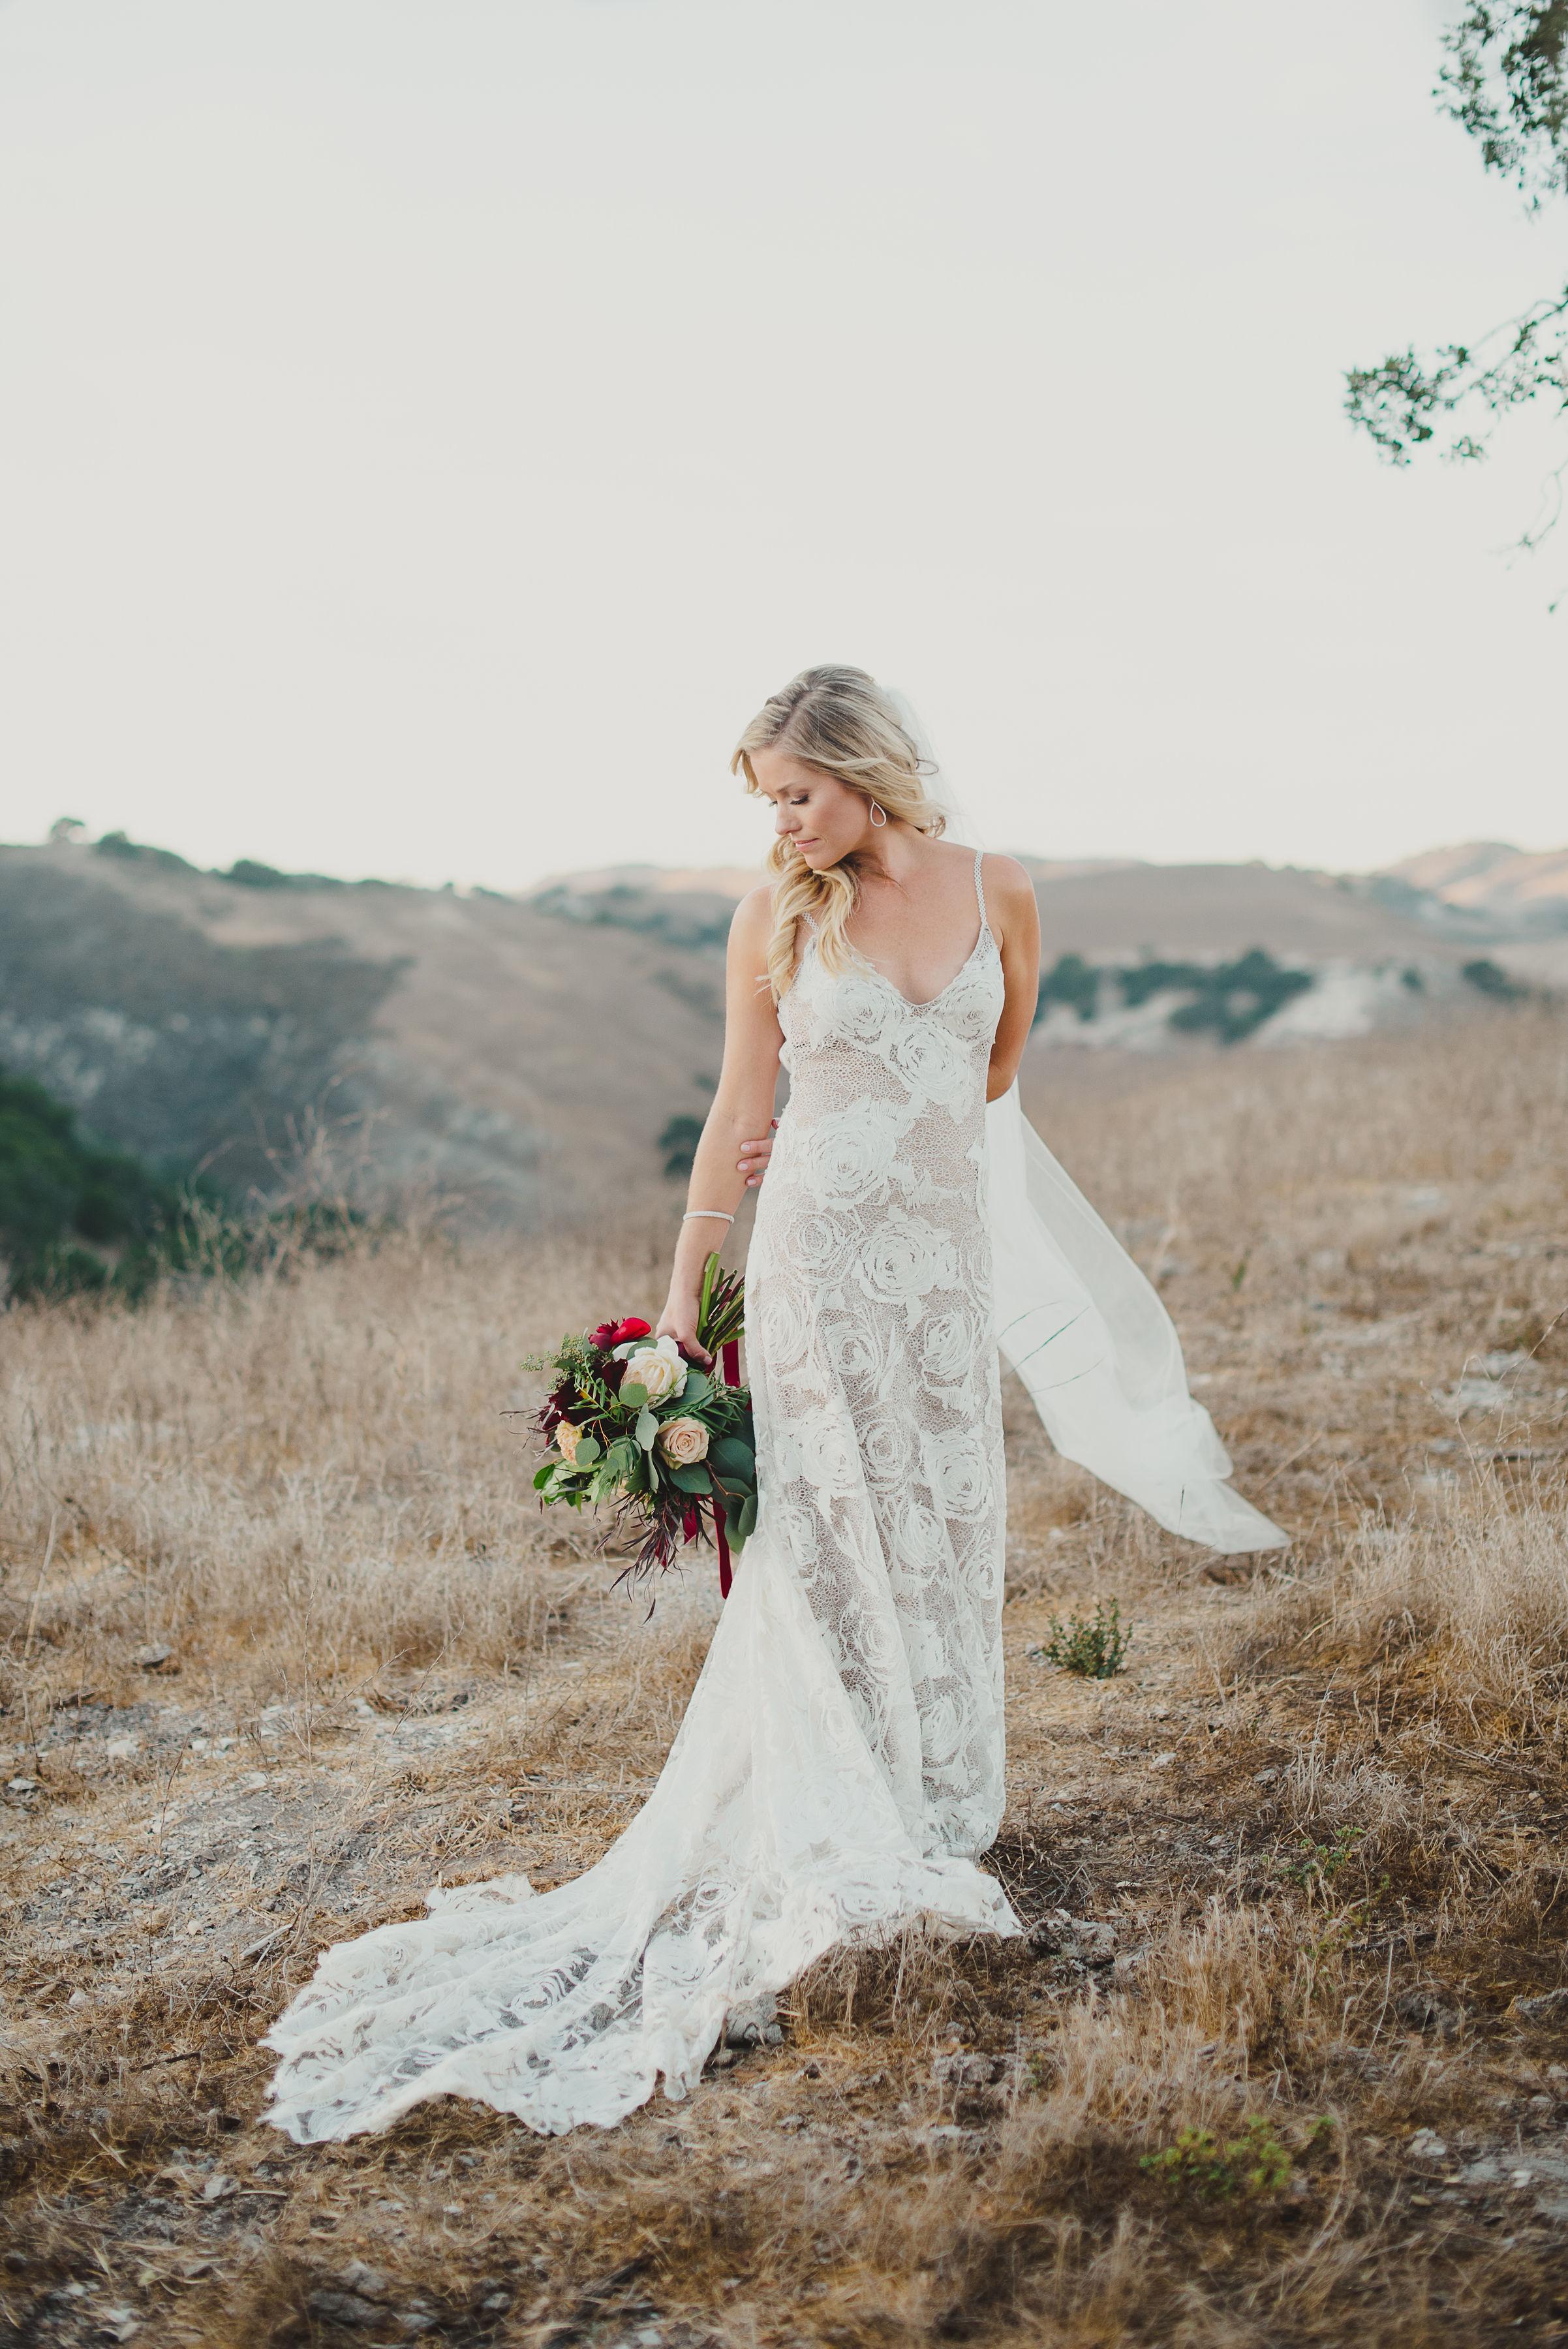 181026-Marisa-JB-Wedding-5394.jpg